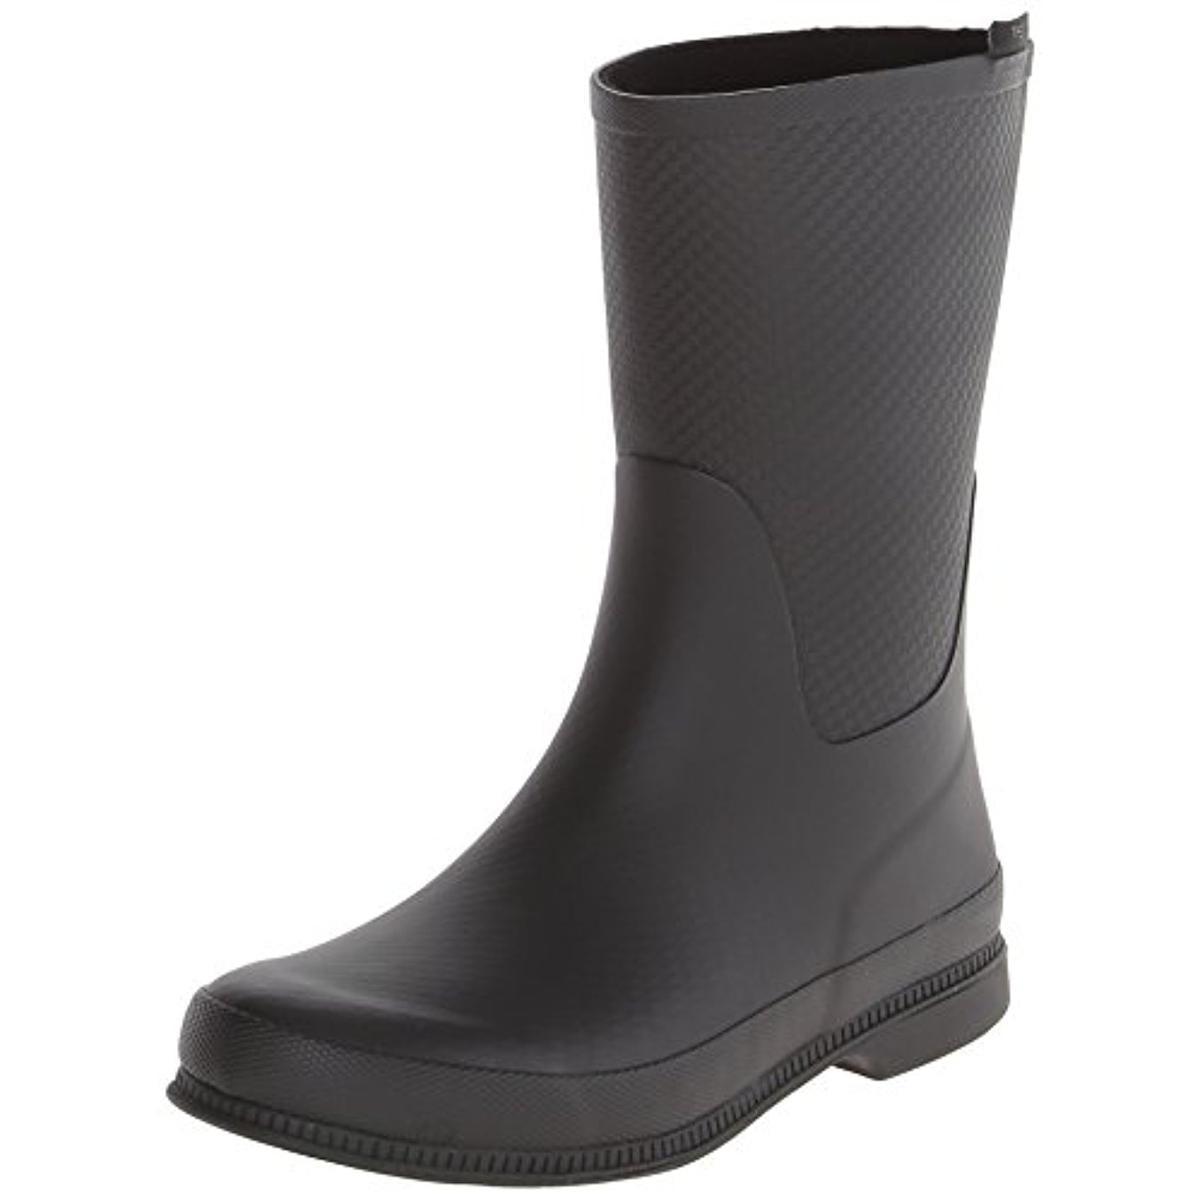 Tretorn Womens Vinter Mid-Calf Rubber Rain Boots by Tretorn